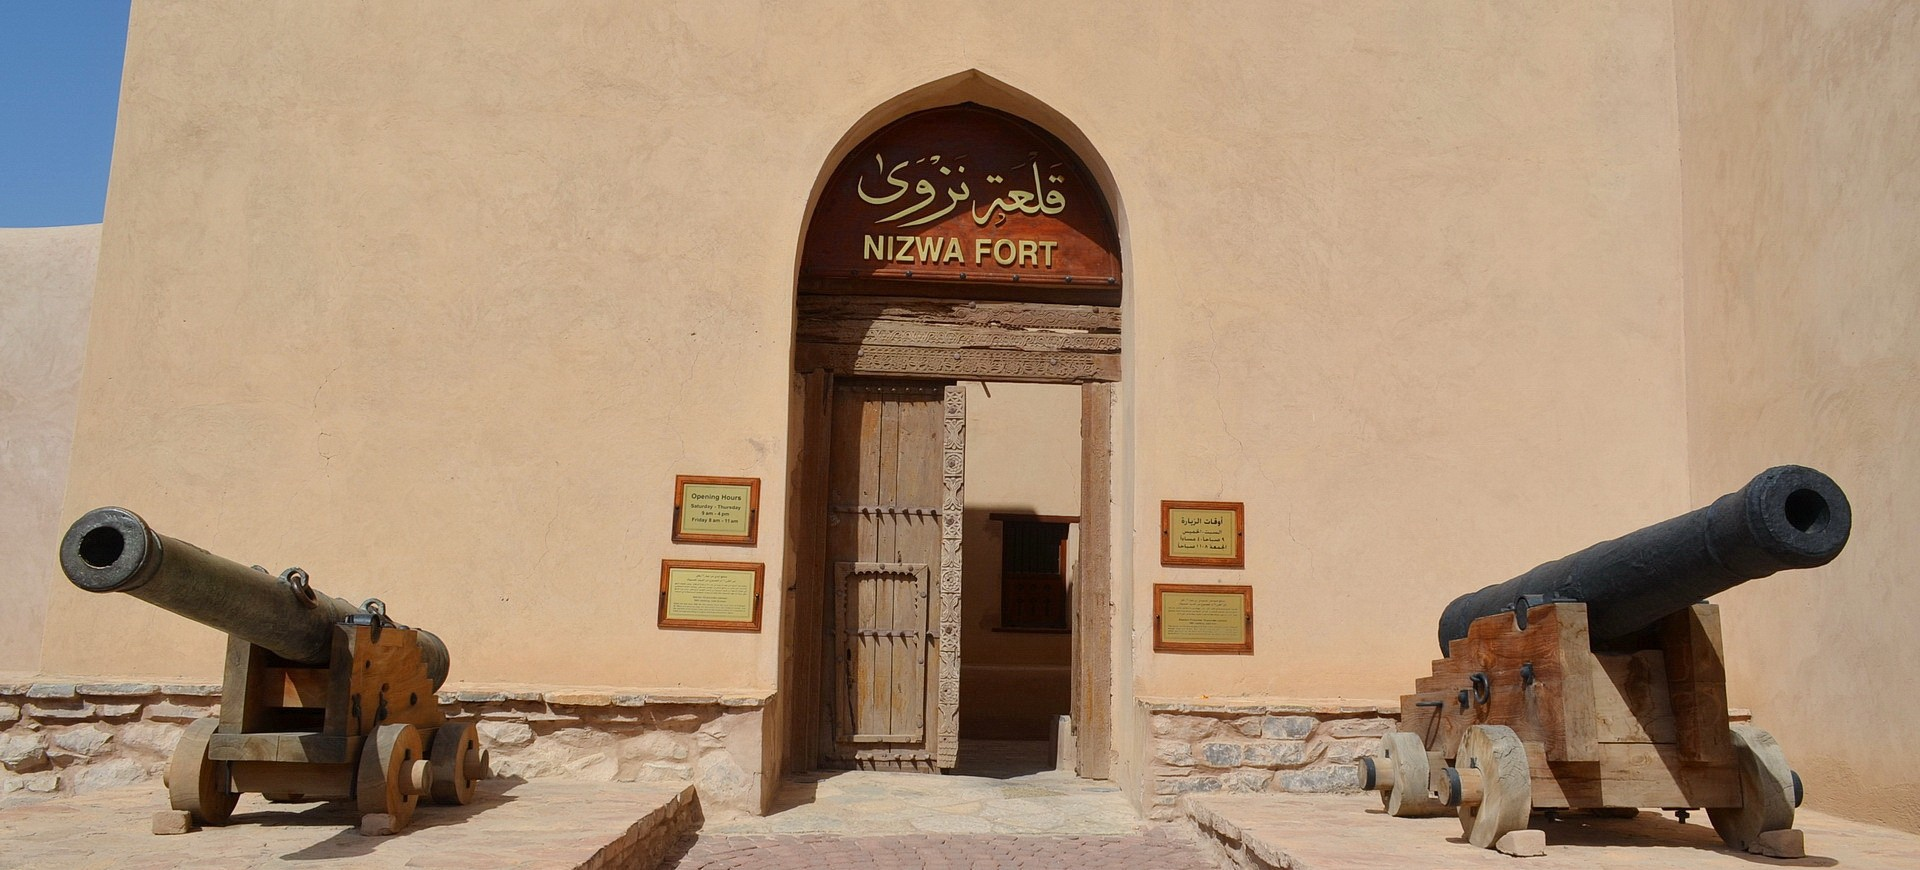 Oman Nizwa Fort Entrée by ZB